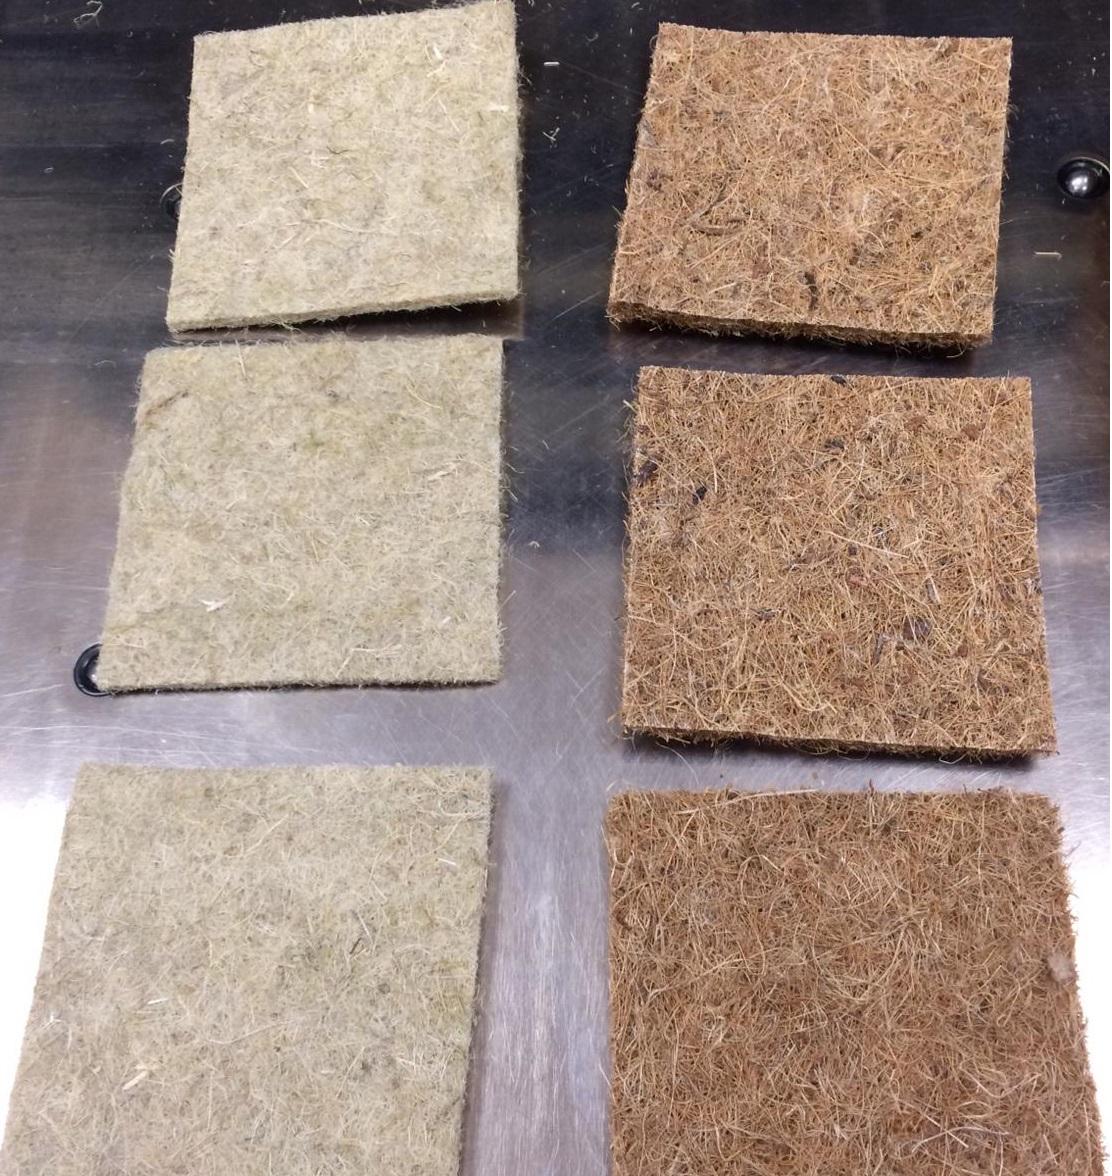 Microgreen pads